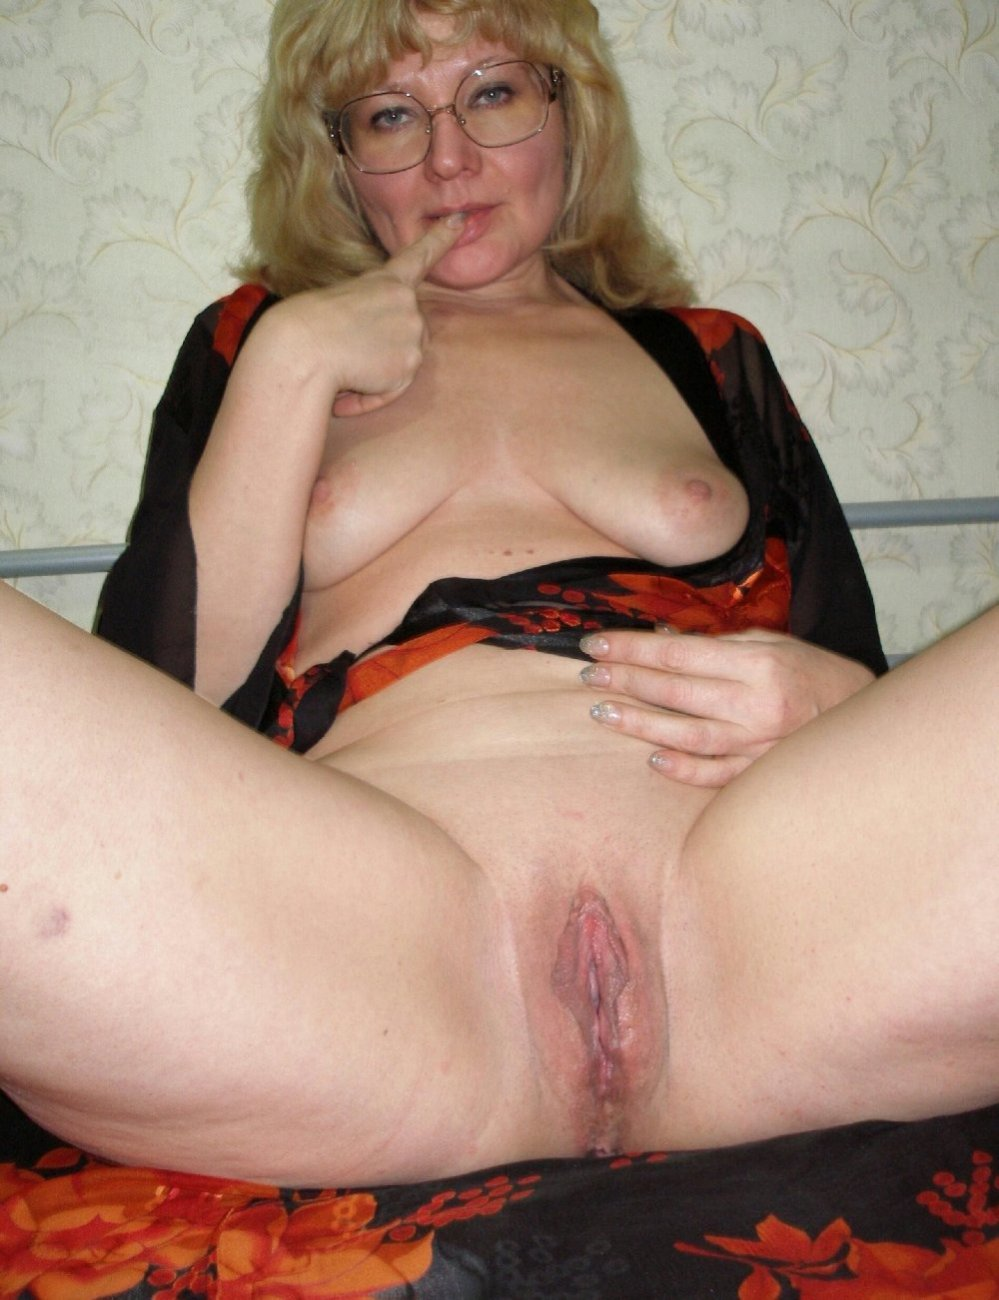 Порно За 50 В Контакте